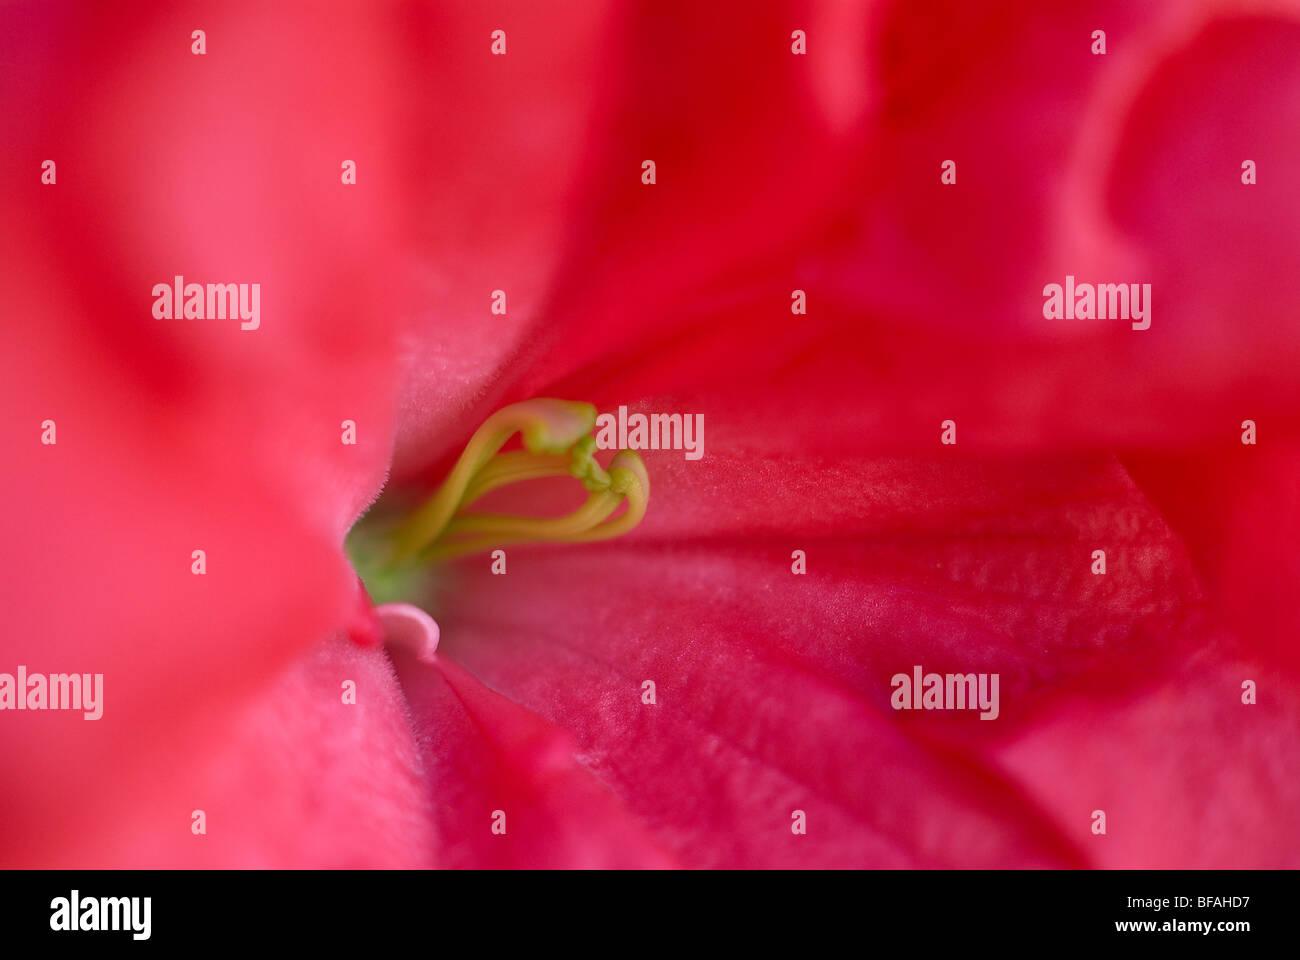 Azalea, pink azalea, magenta, stamen, close-up, close up, bright pink flower Stock Photo